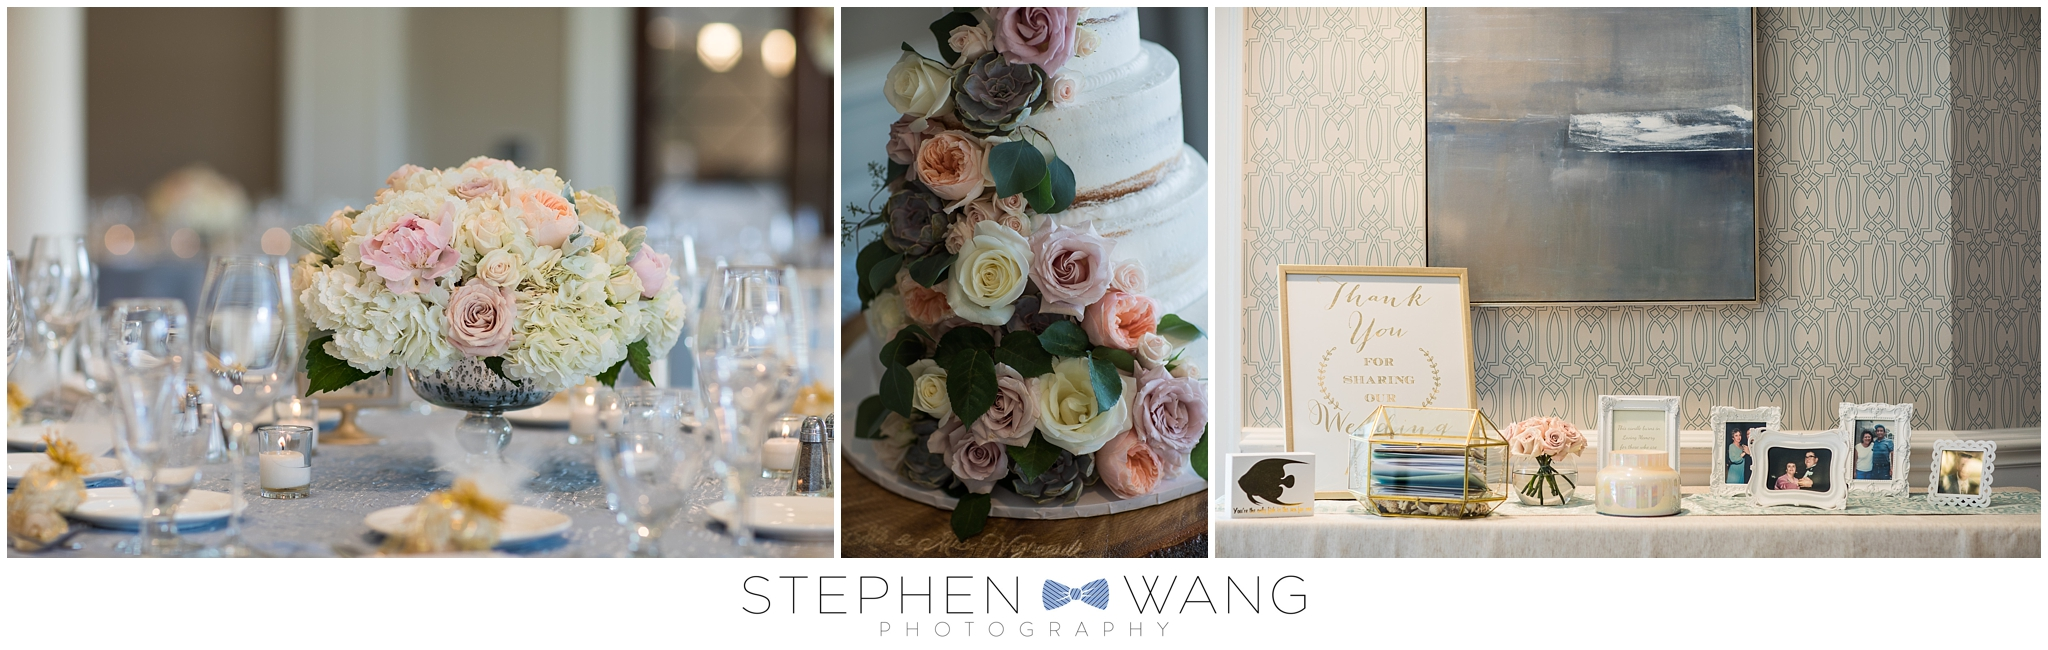 Stephen Wang Photography Shorehaven Norwalk CT Wedding Photographer connecticut shoreline shore haven - 29.jpg